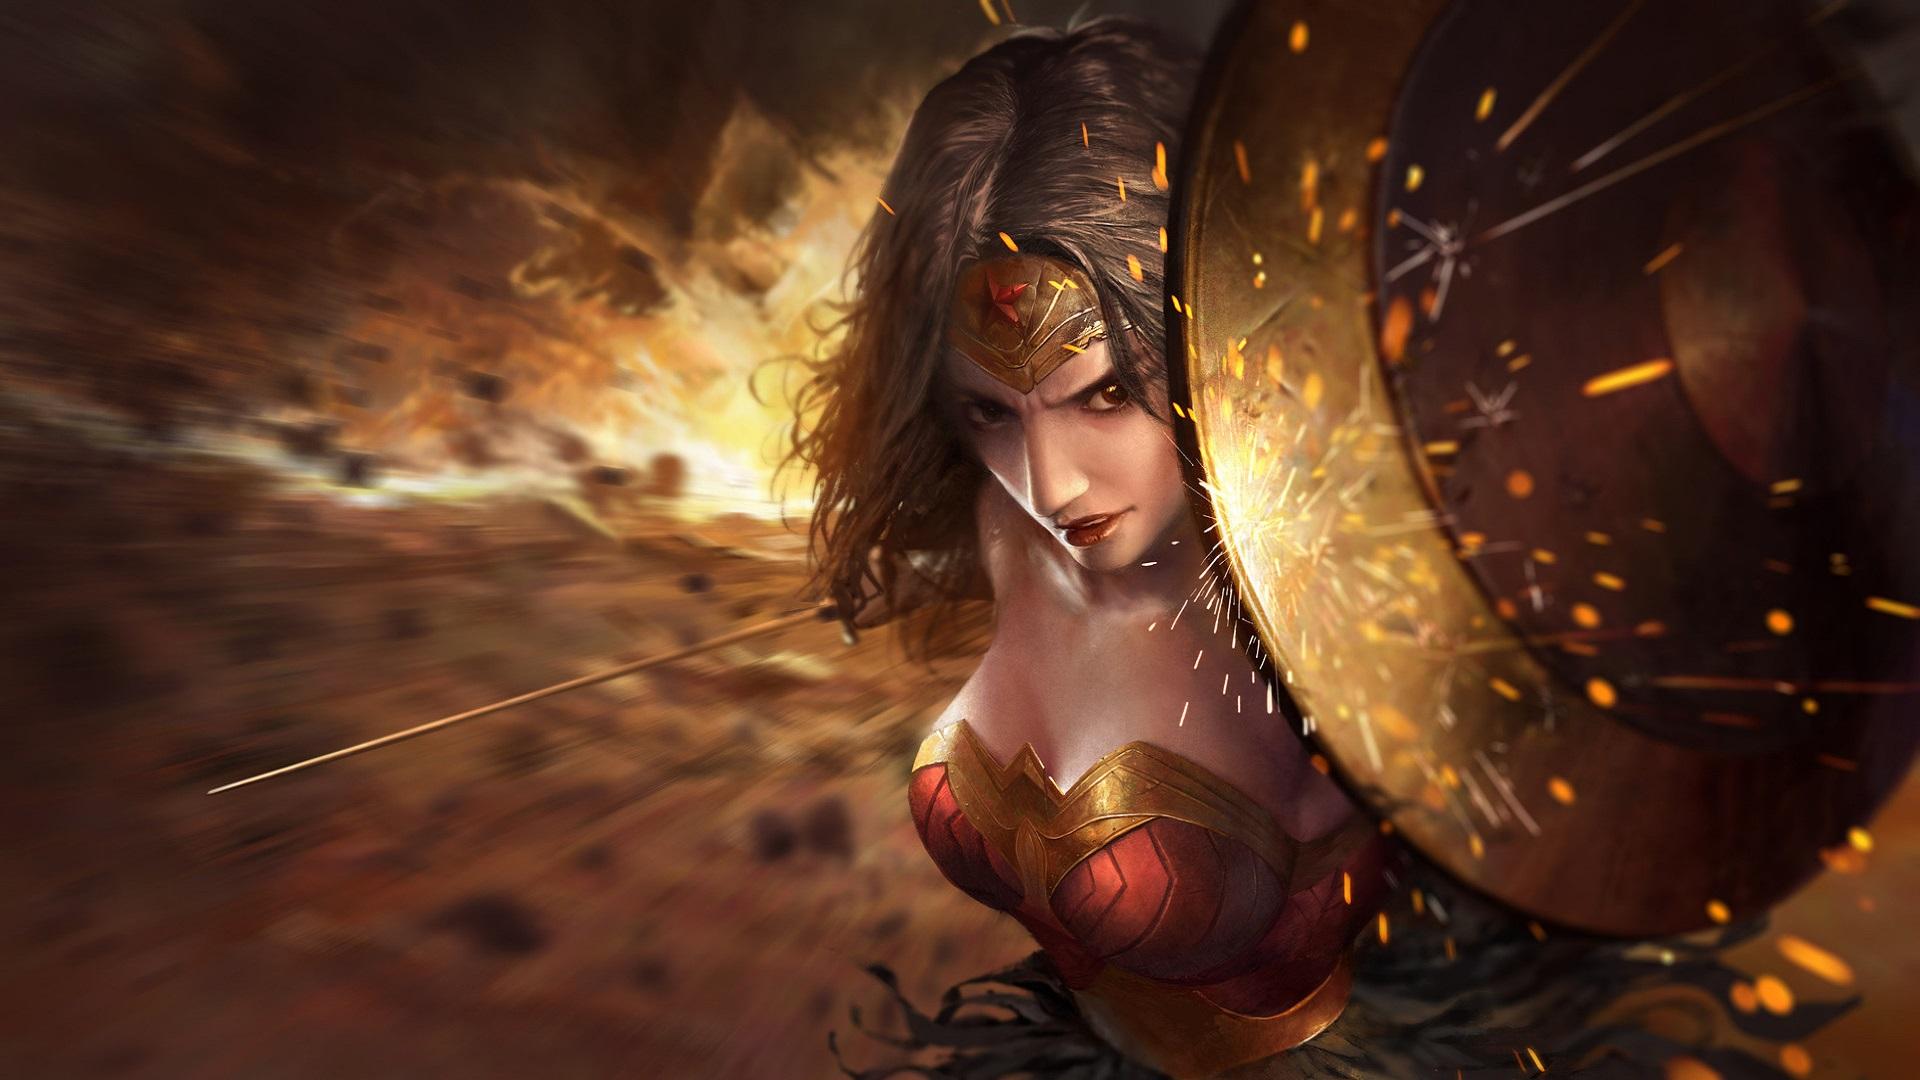 1280x1024 Wonder Woman Movie 1280x1024 Resolution Hd 4k: Wonder Woman Amazing Artwork Shield, HD Superheroes, 4k